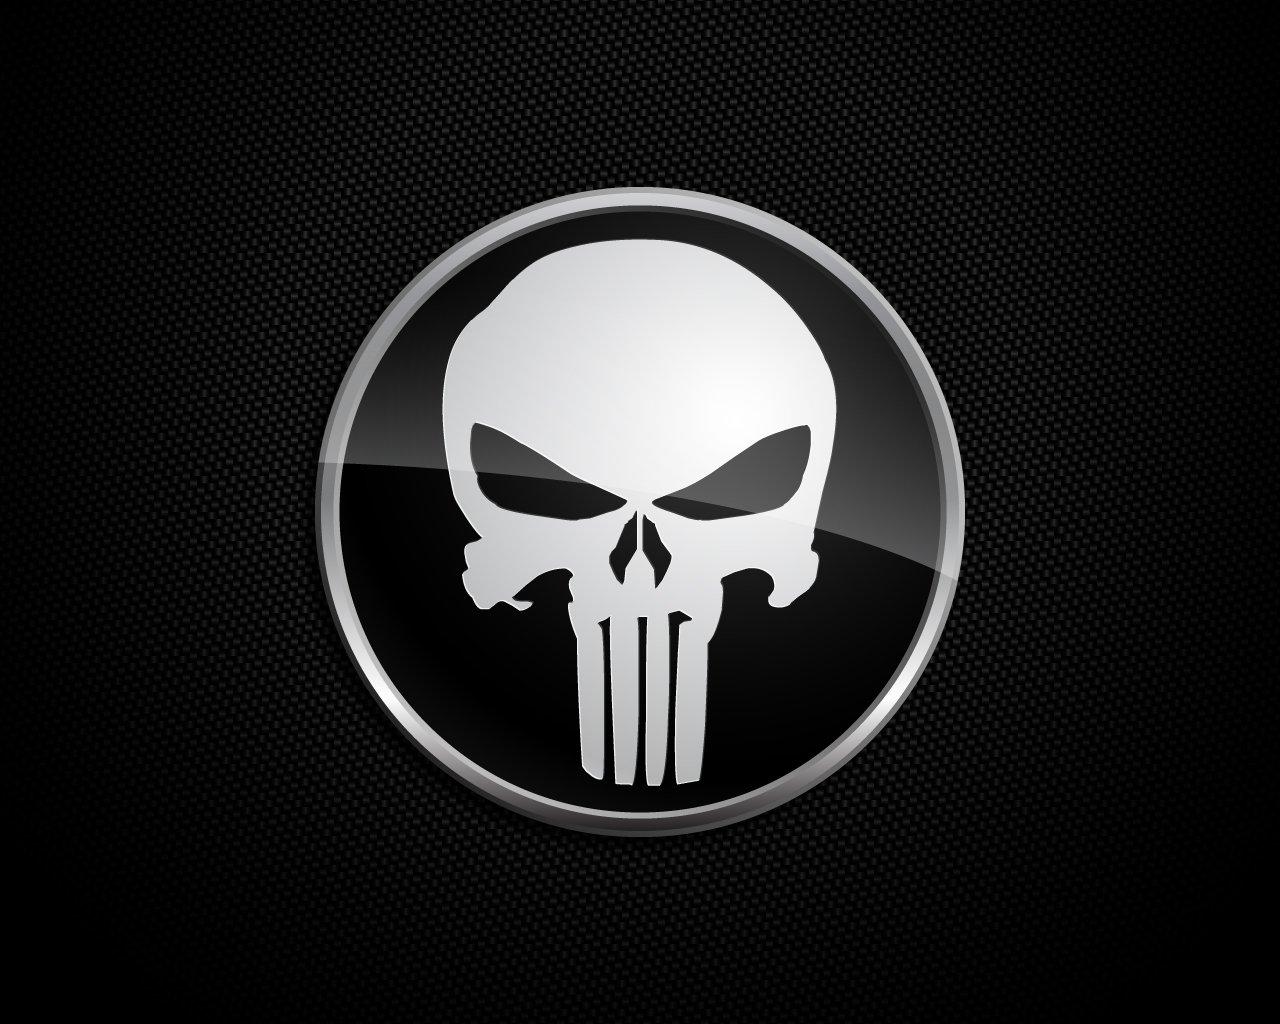 Punisher Skull - HD Wallpaper